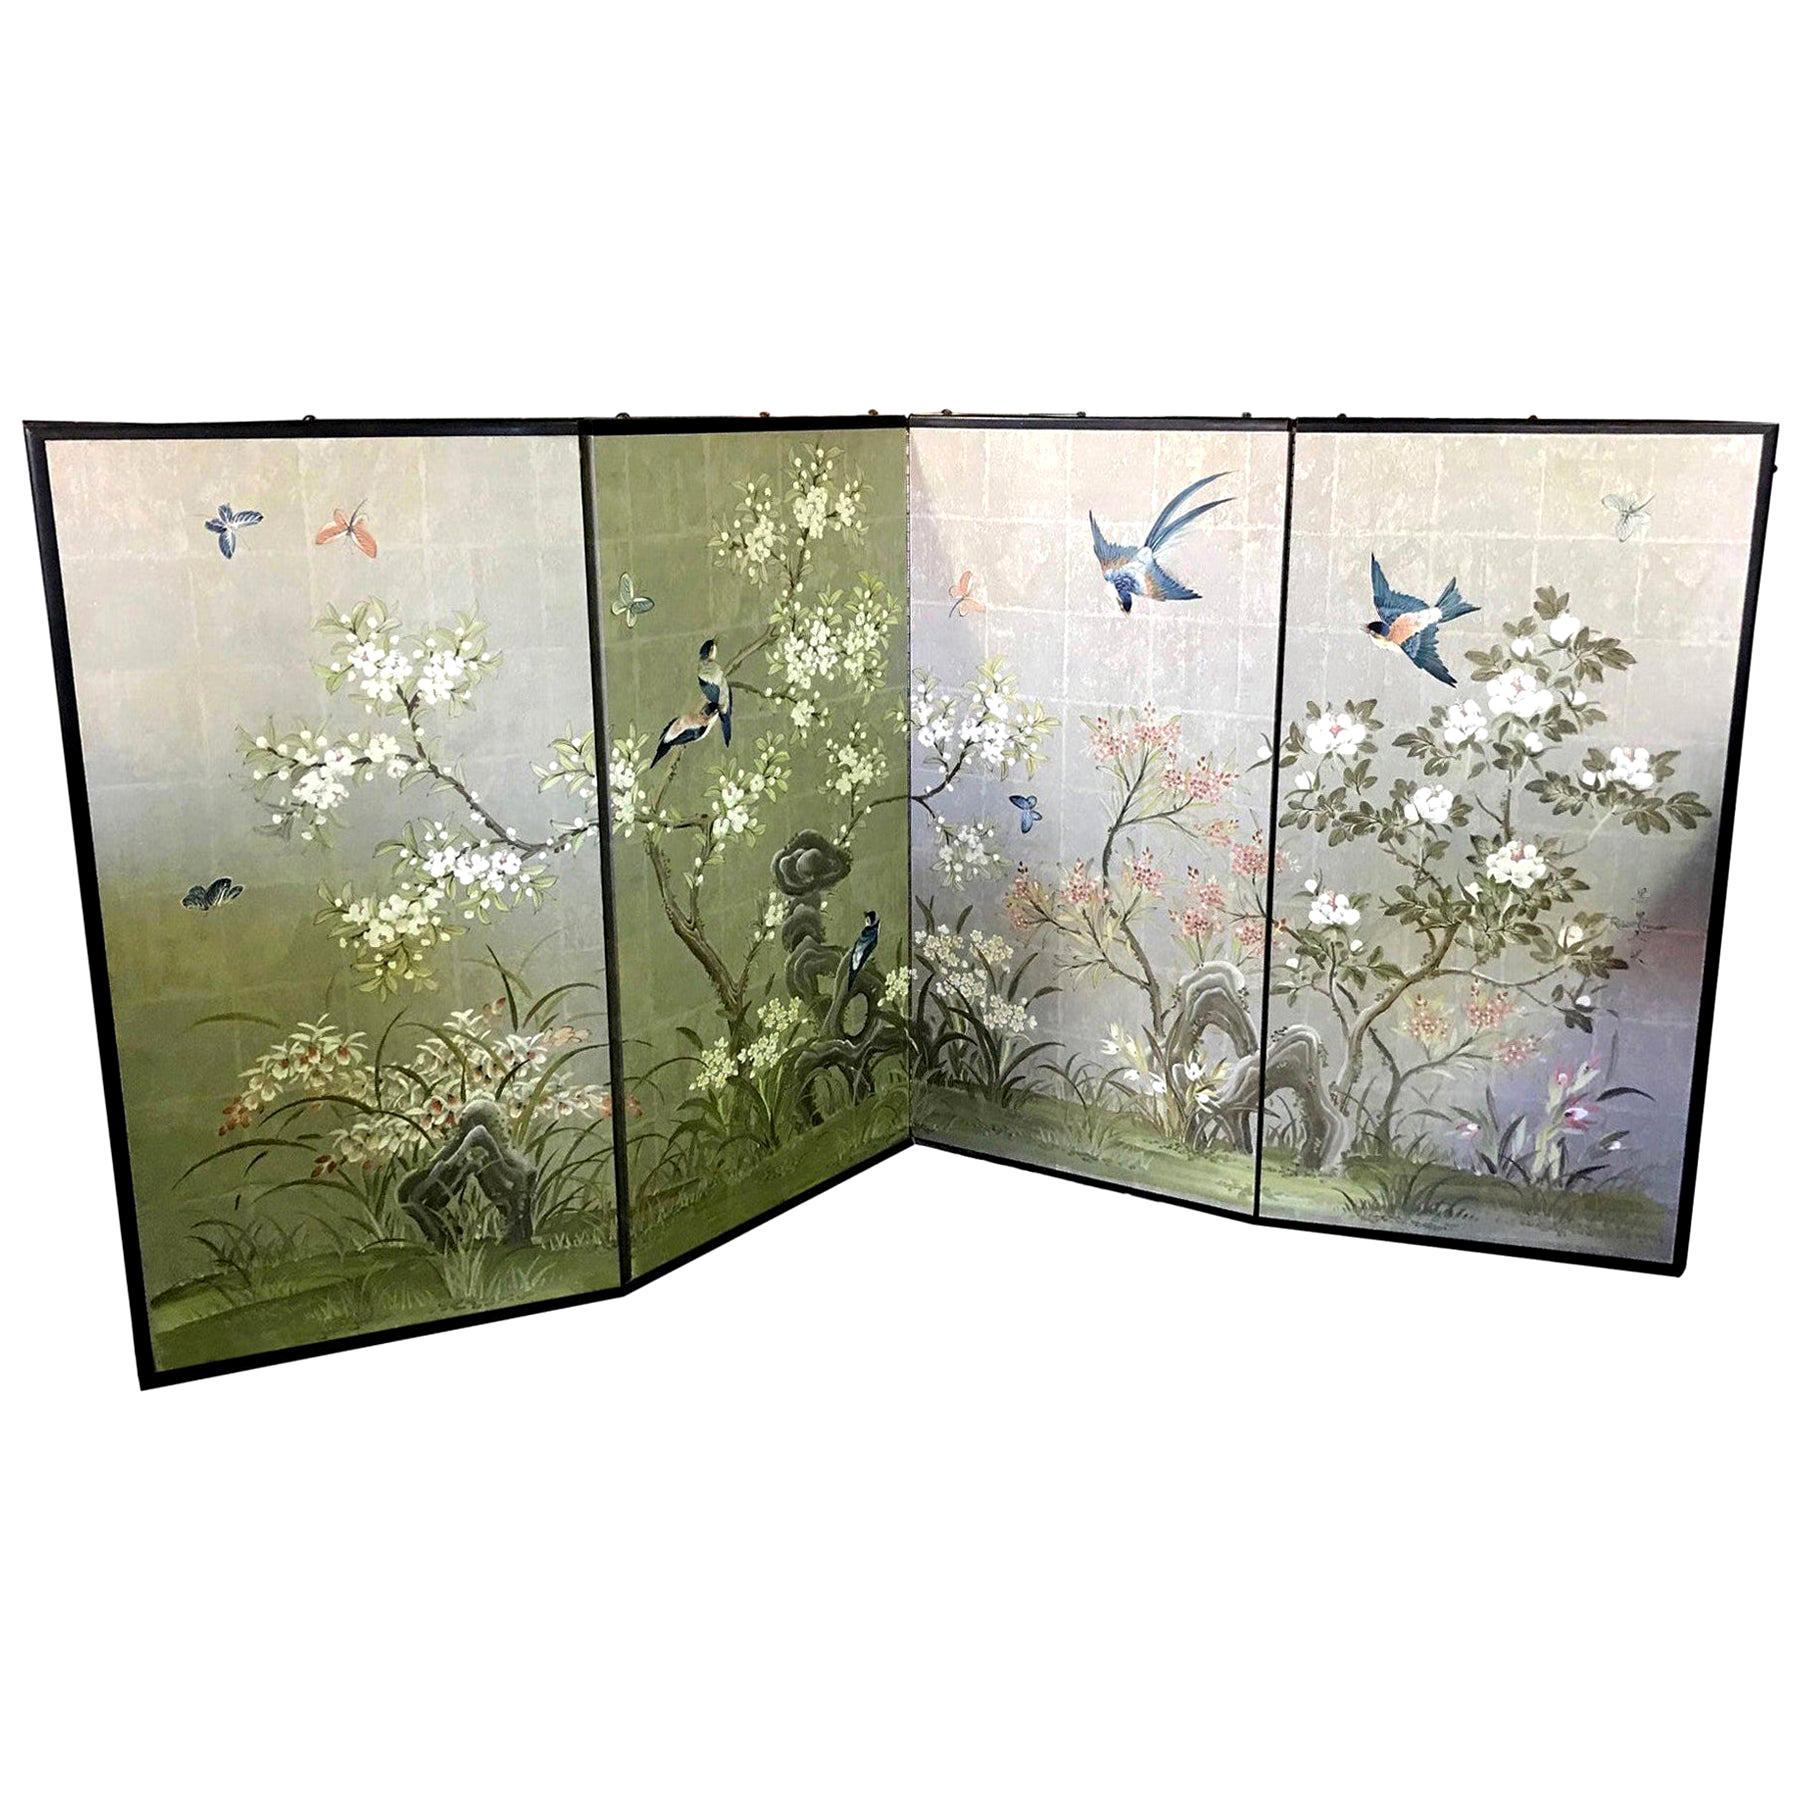 Robert Crowder Hand Painted Four-Panel Japanese Asian Byobu Screen Playful Birds